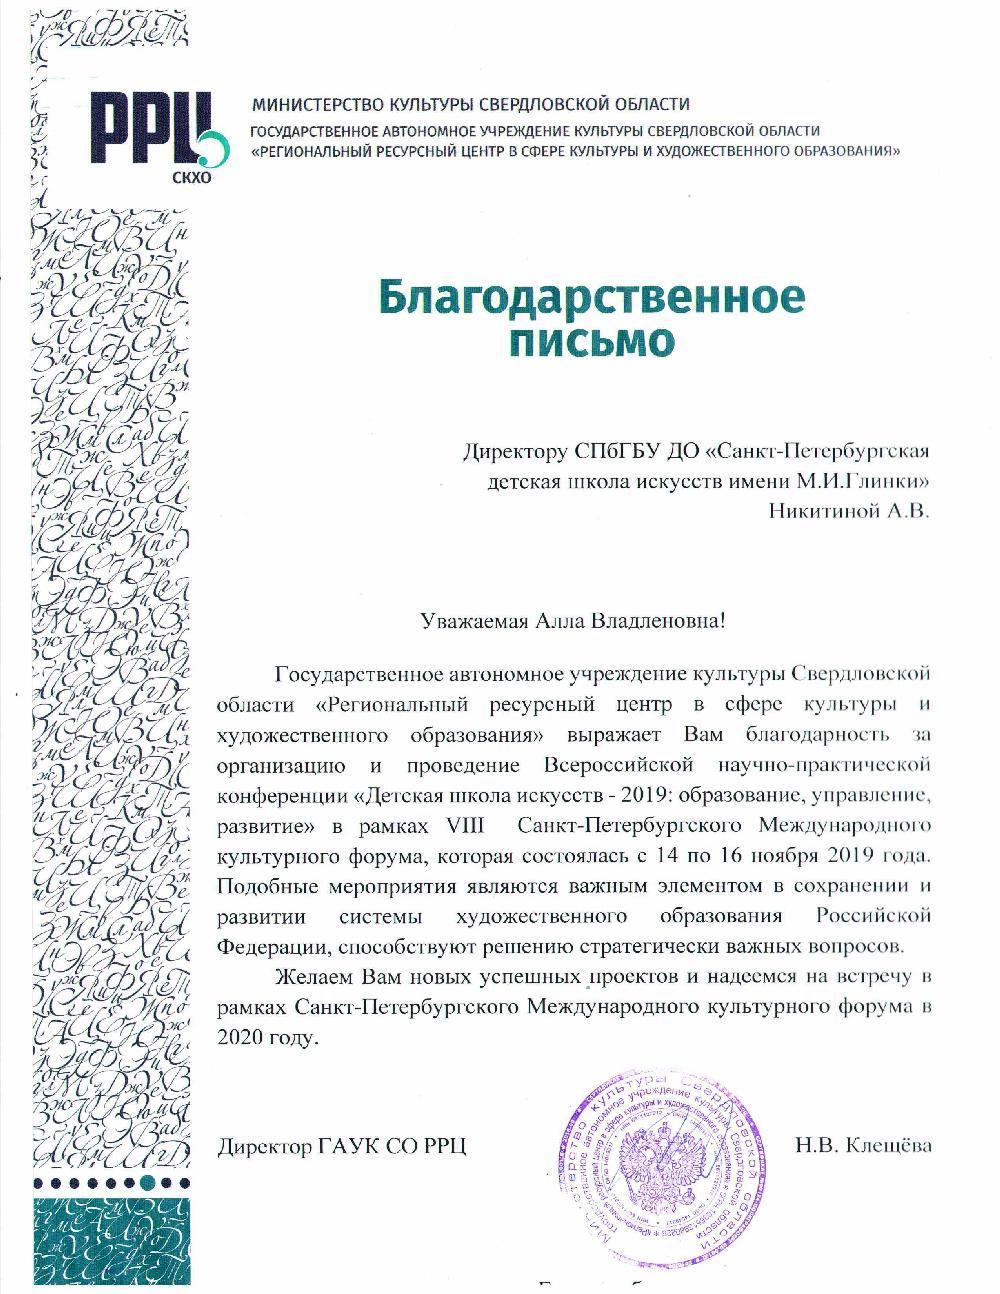 2019 Conference Blagodarnost RRC Sverdlovskoi Oblasti